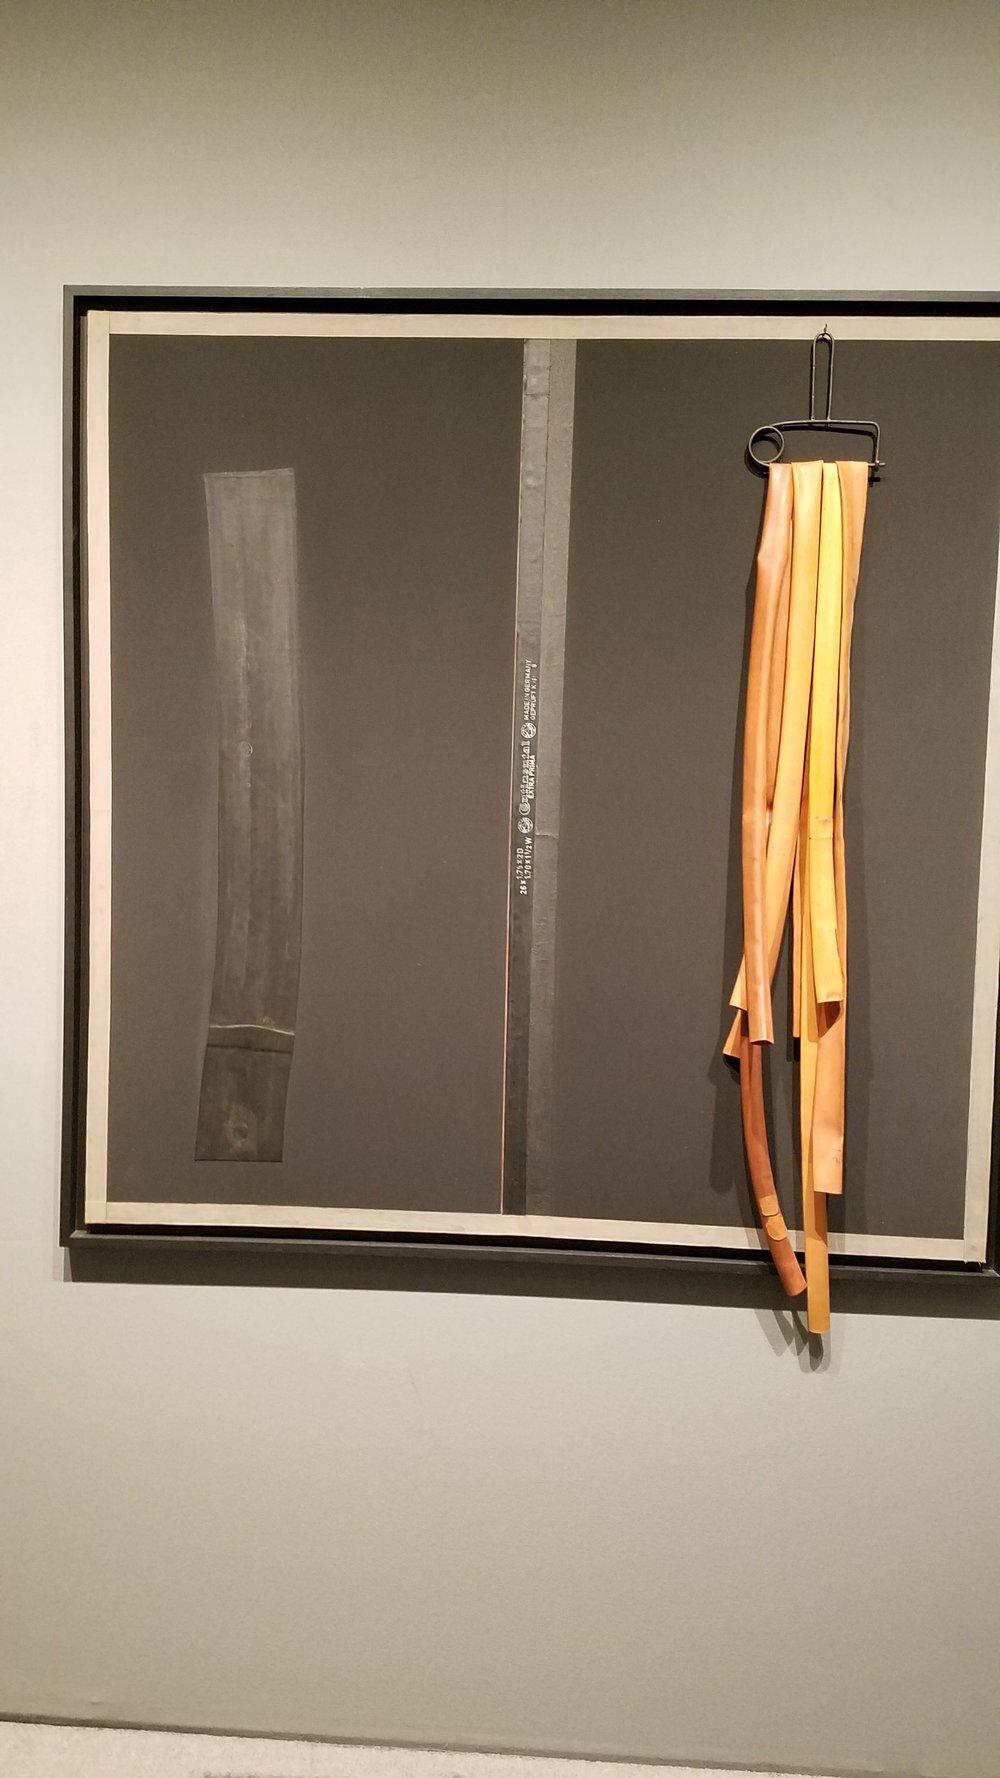 Carol Rama, Movemento e Immobilita de Bilmam, 1977